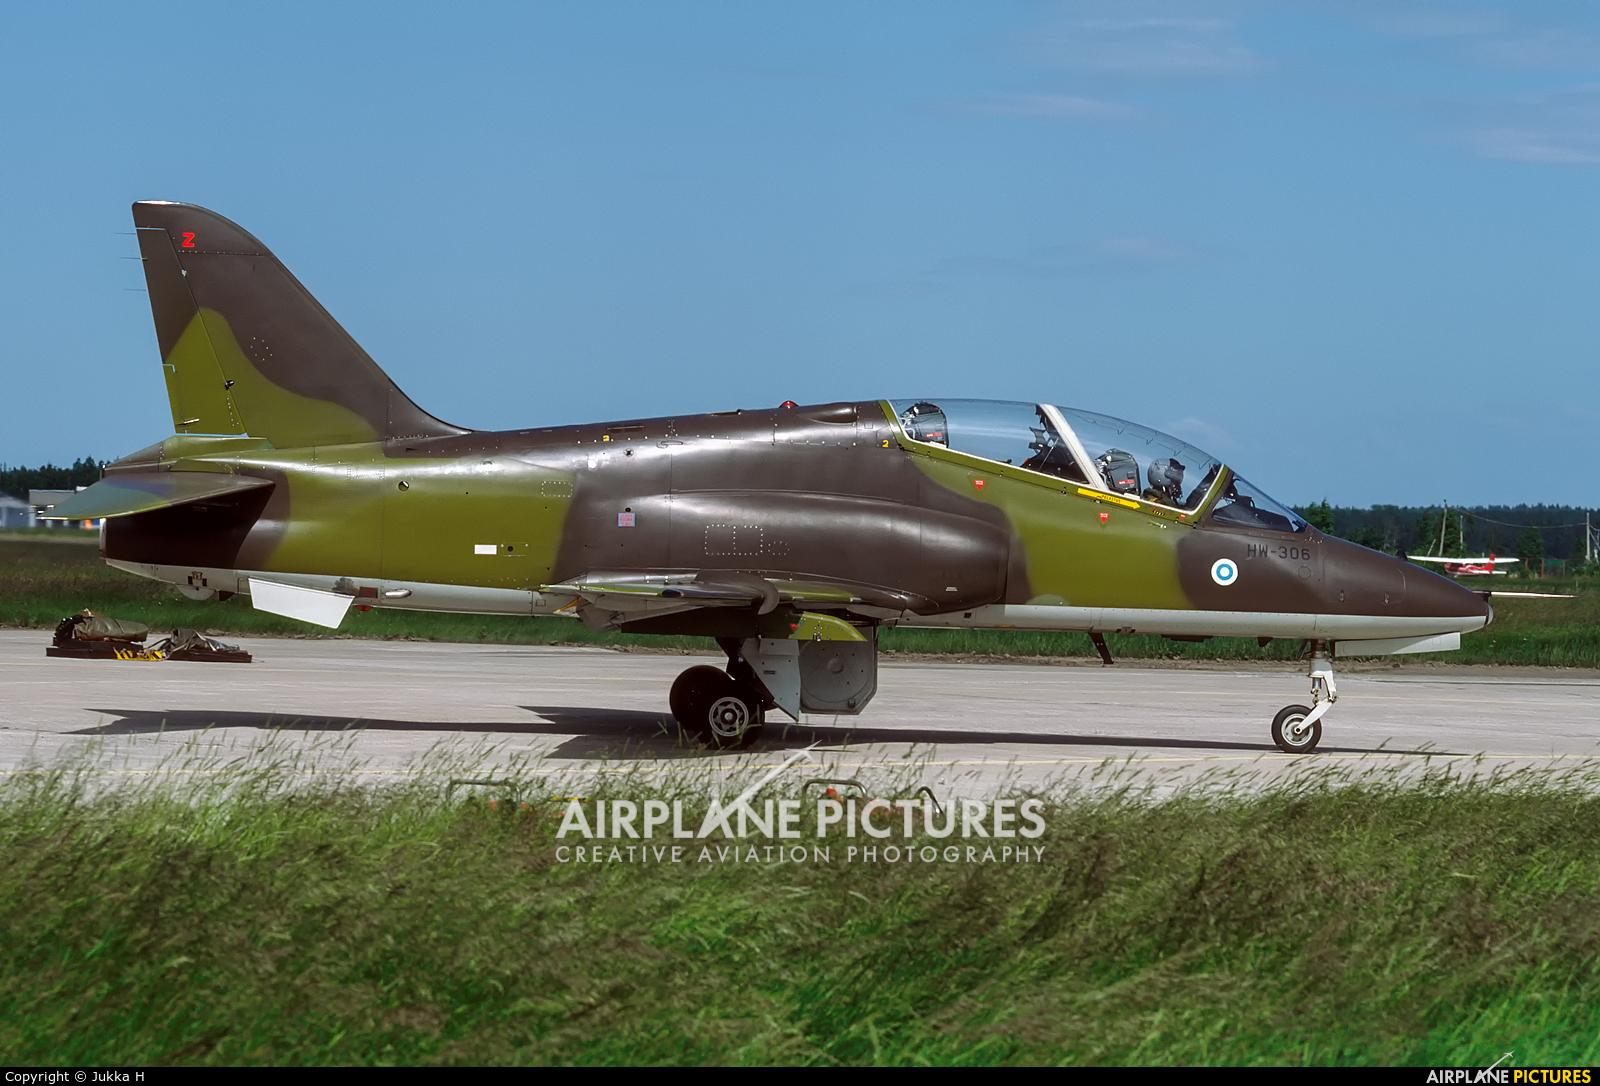 Finland - Air Force: Midnight Hawks HW-306 aircraft at Kauhava